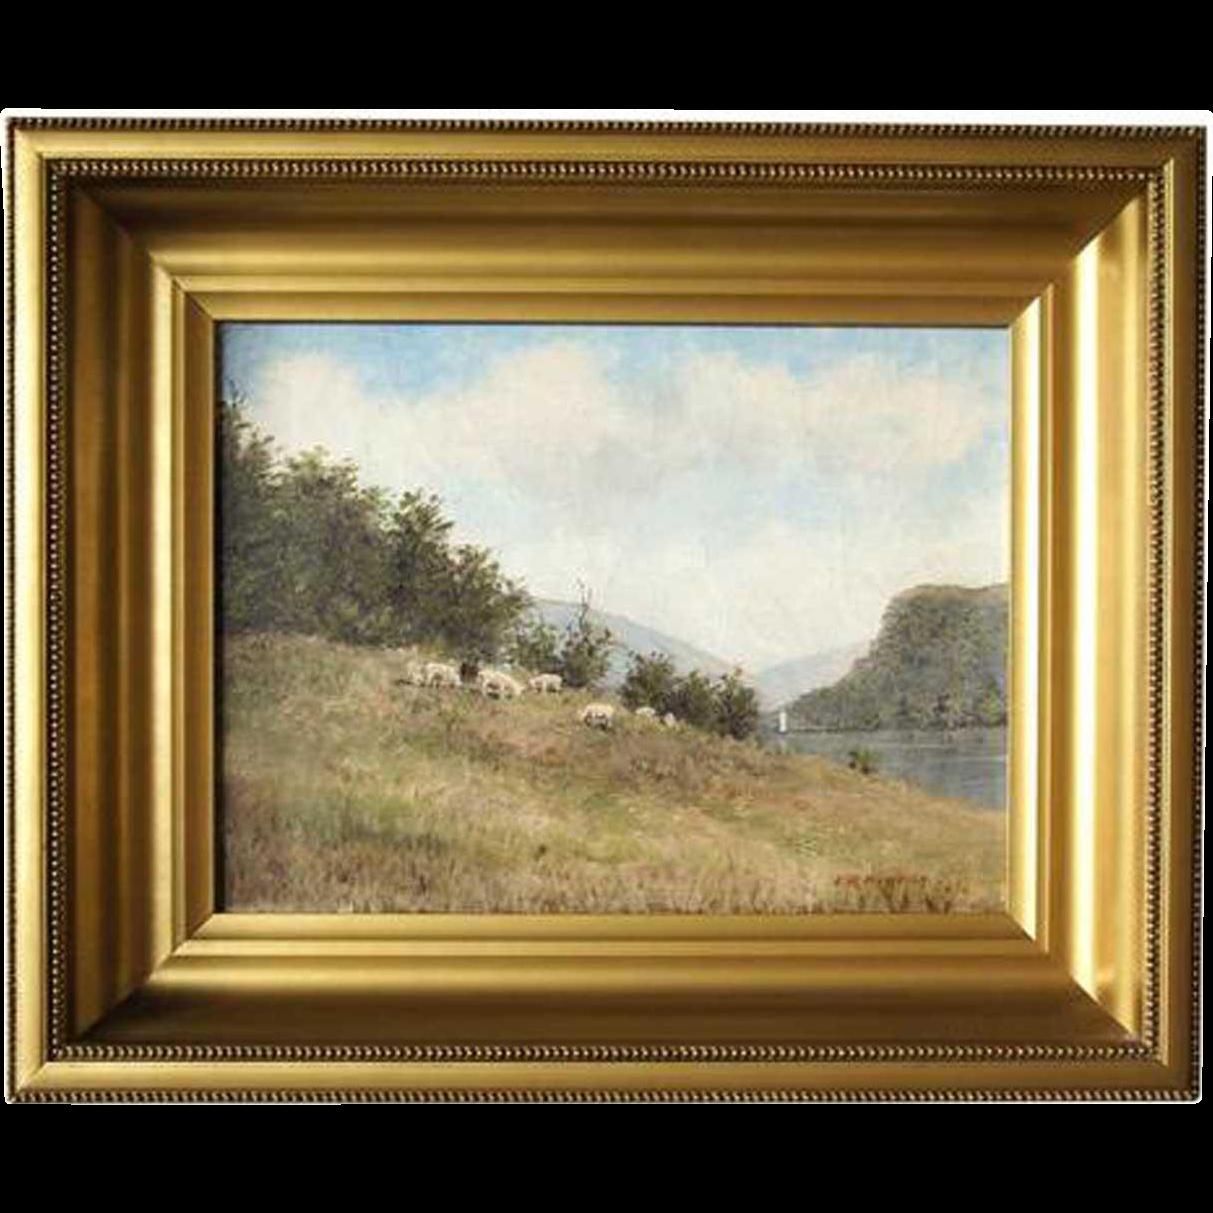 EDWARD ROMAINE BOWDISH Oil on Canvas Painting, Pastoral Landscape